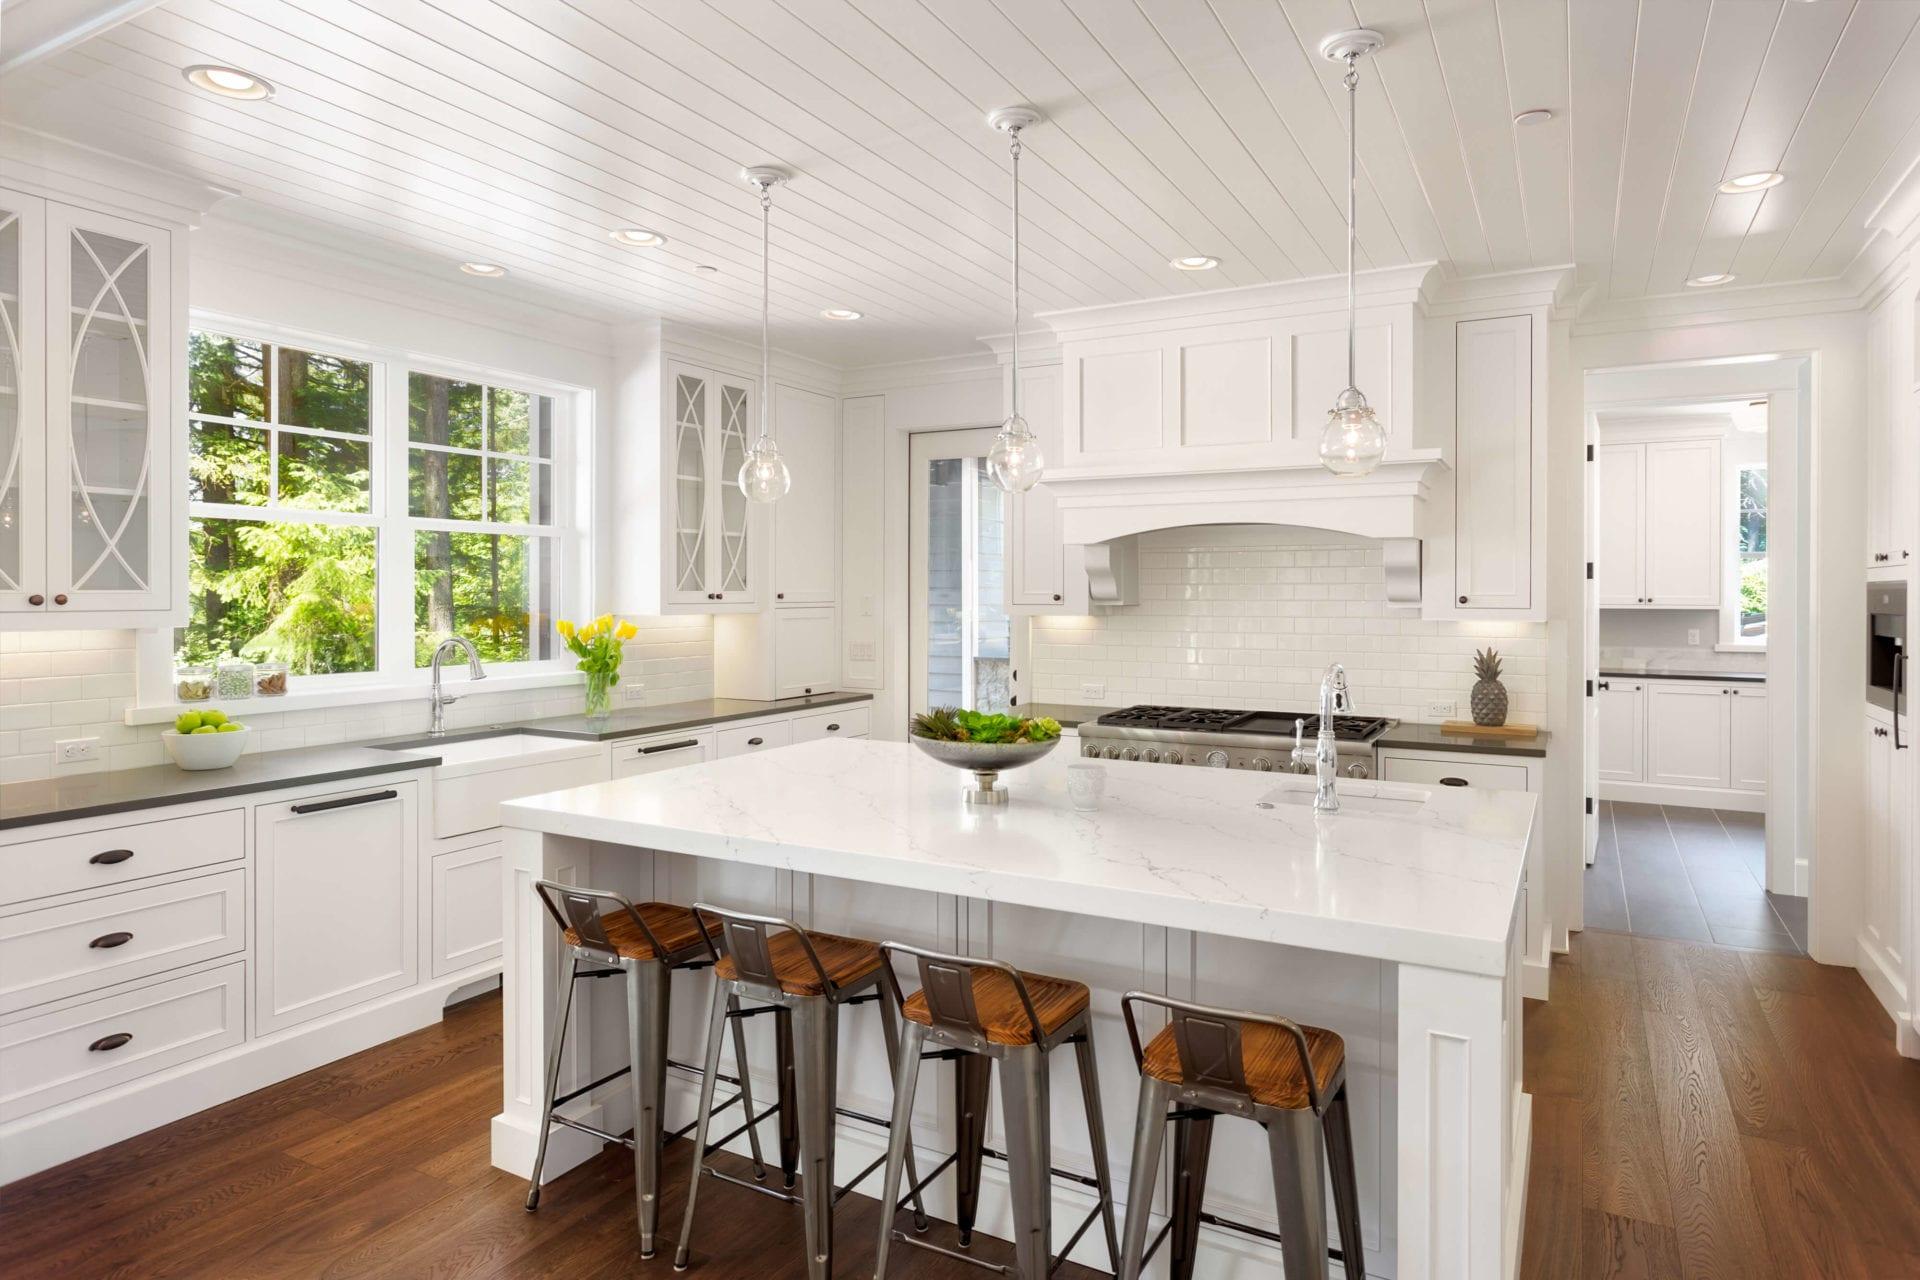 Clean white marble white cabinet kitchen in organized home Redondo beach southern California